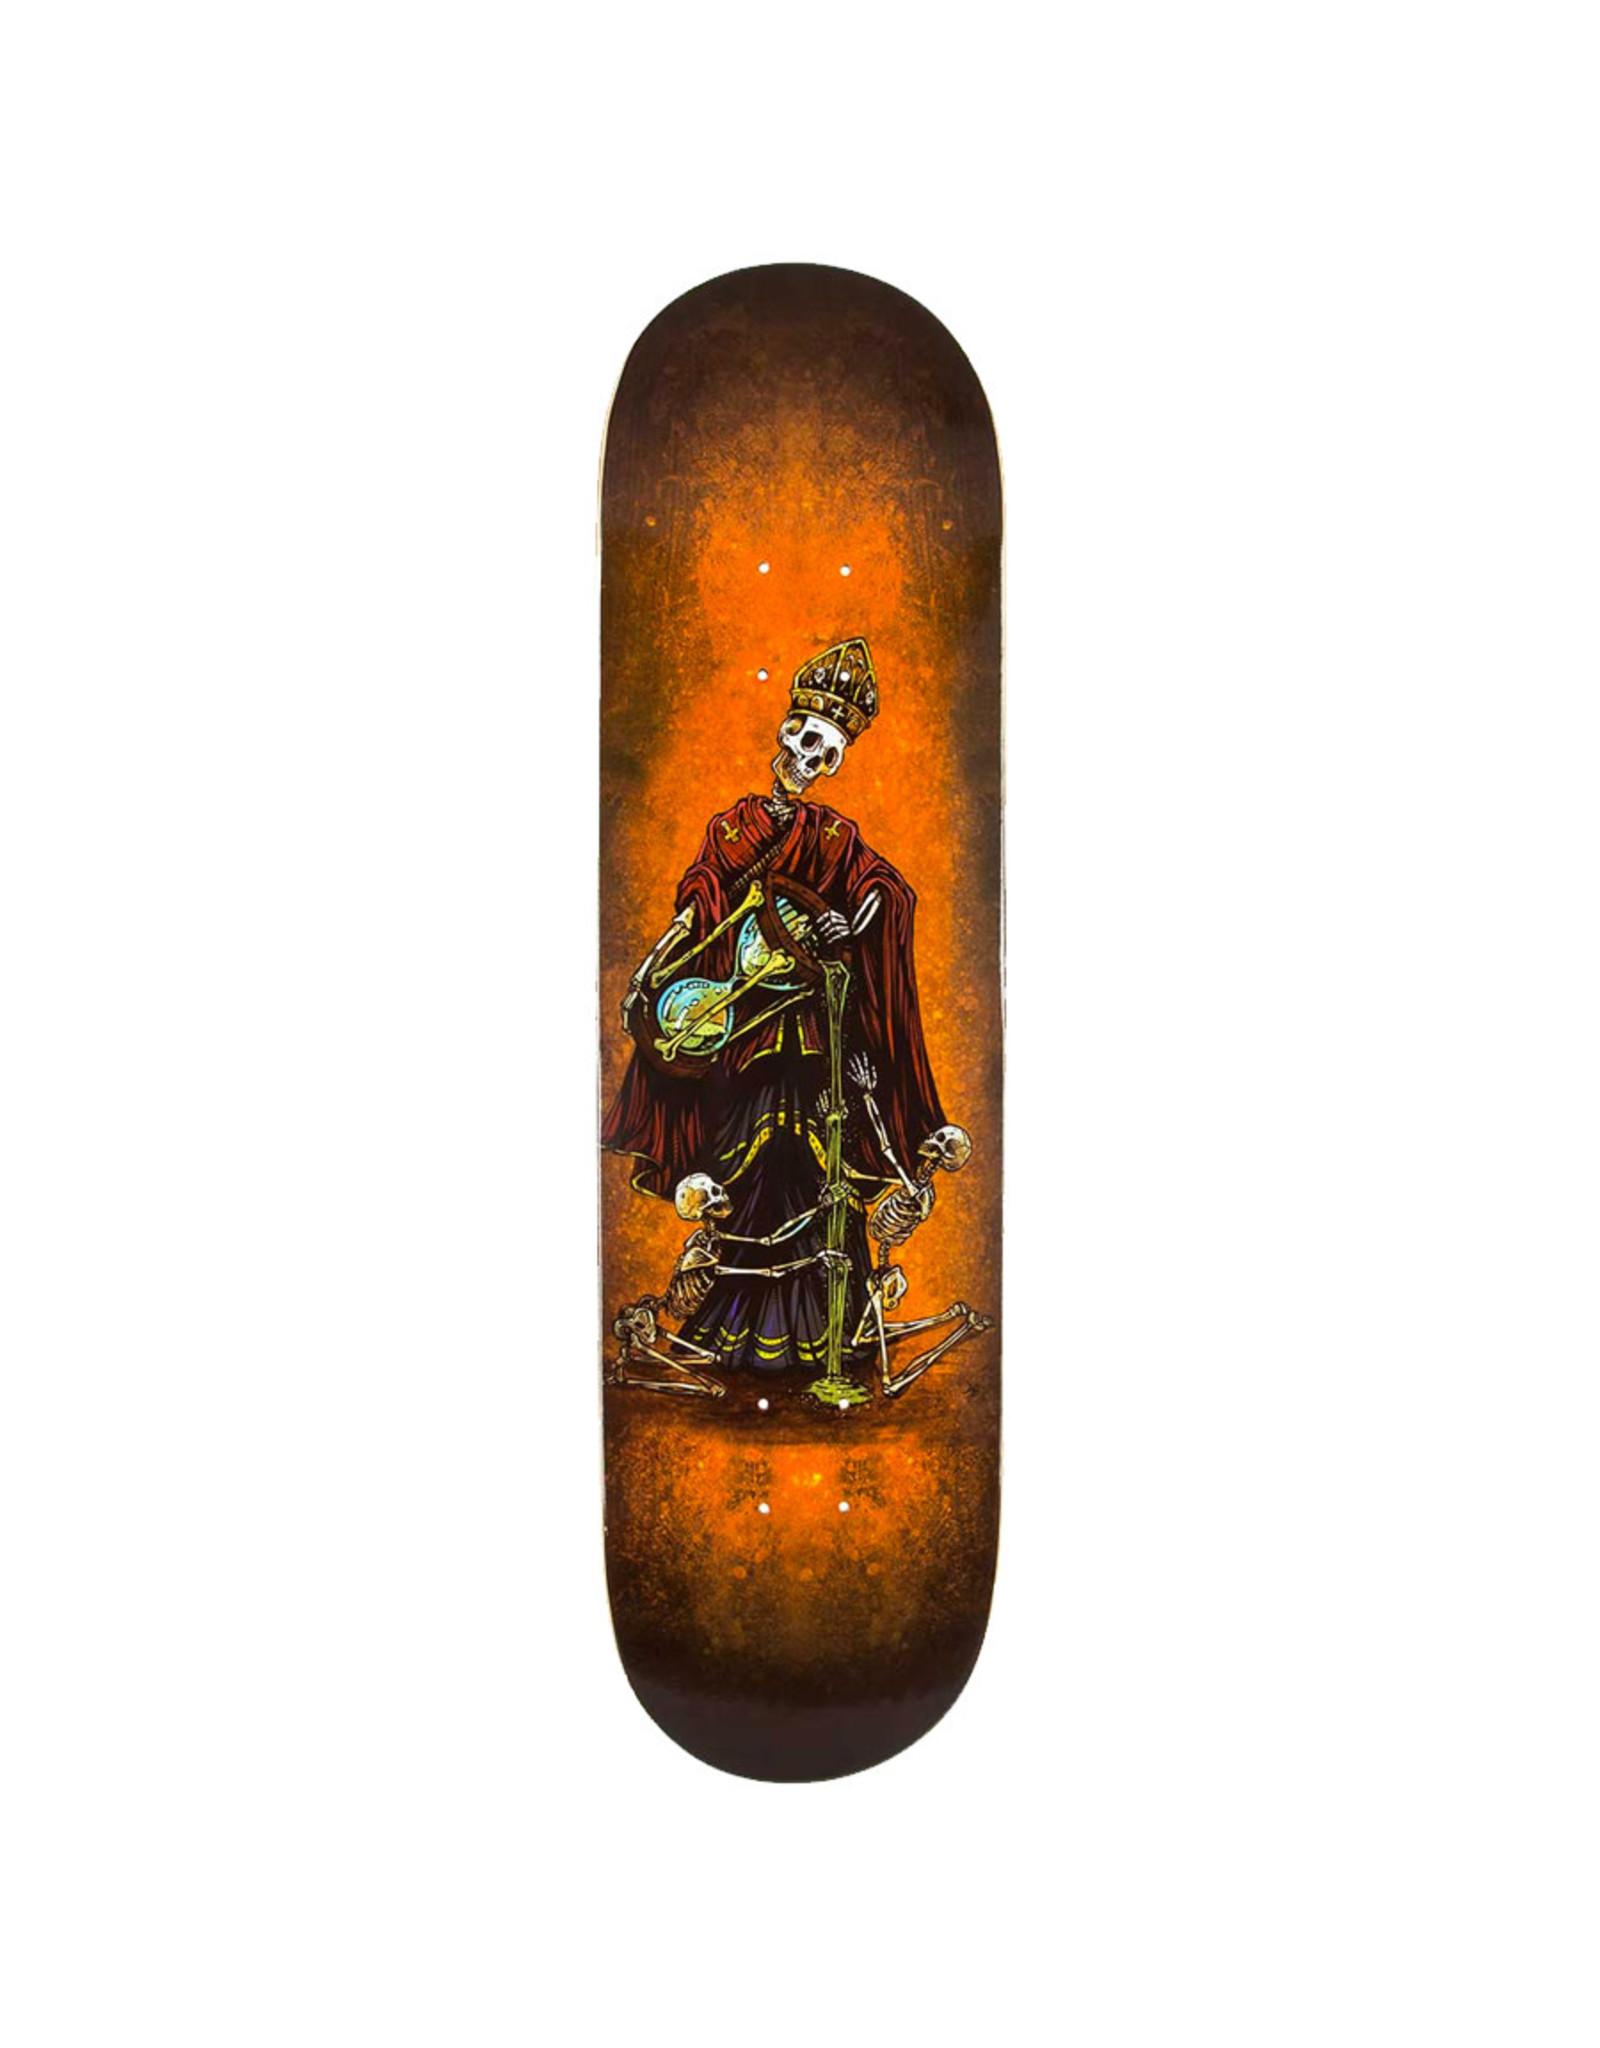 Techne Skateboards Techne Deck Father Time (8.25)